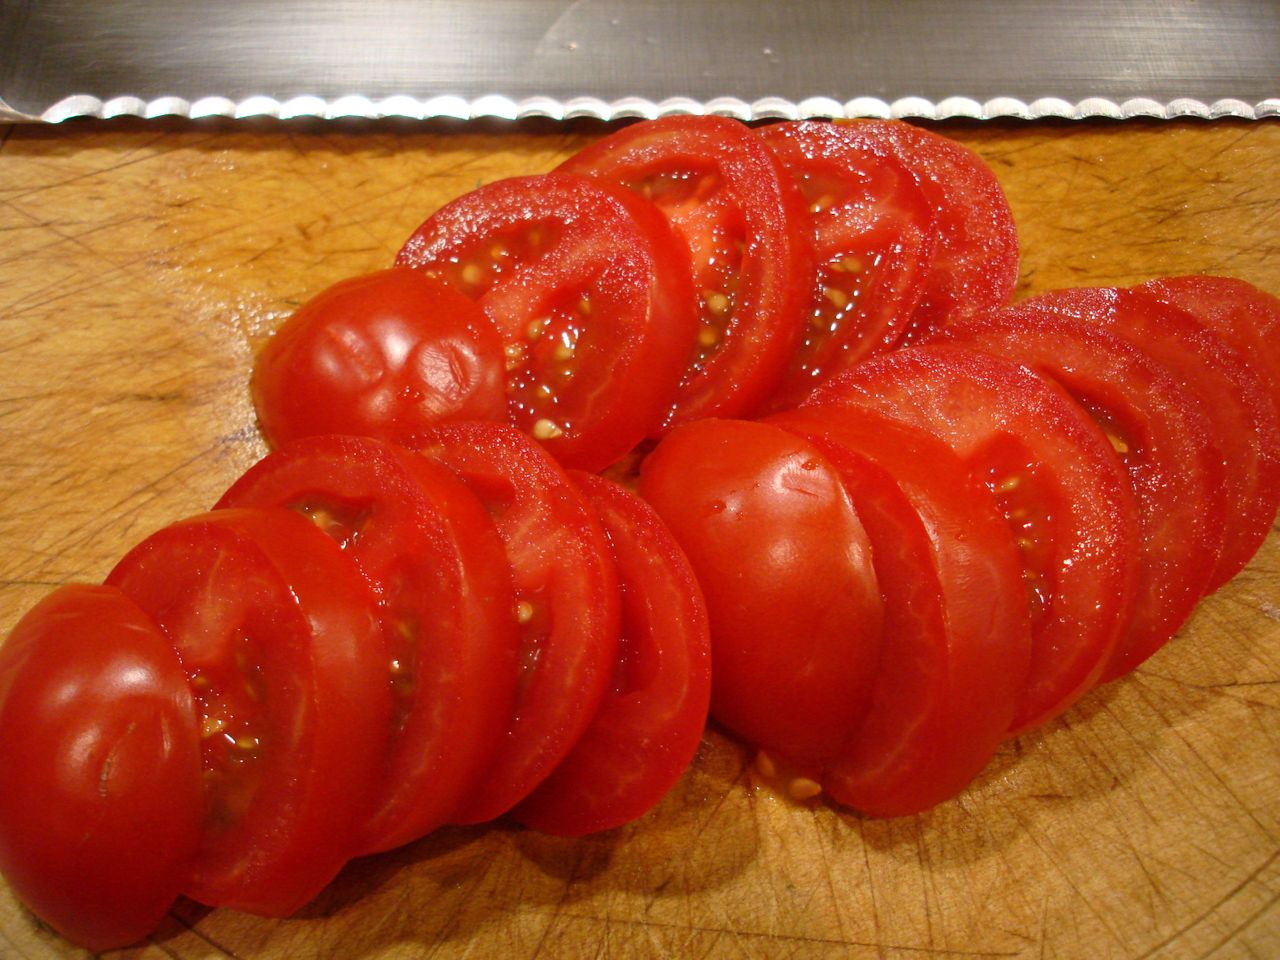 tomatoes_serated_edge.JPG